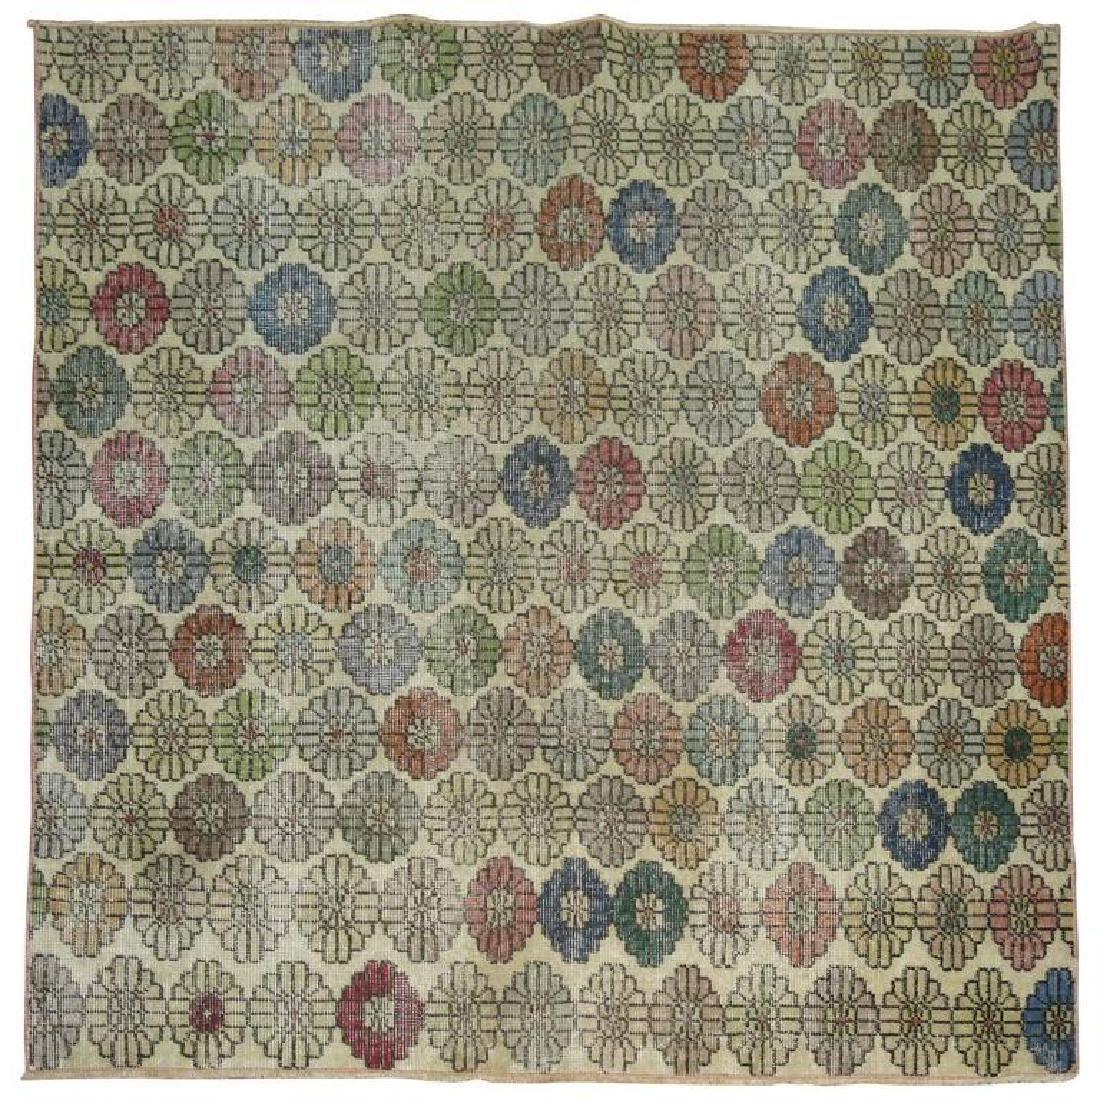 Vintage Turkish Deco Square Rug 4.11x5